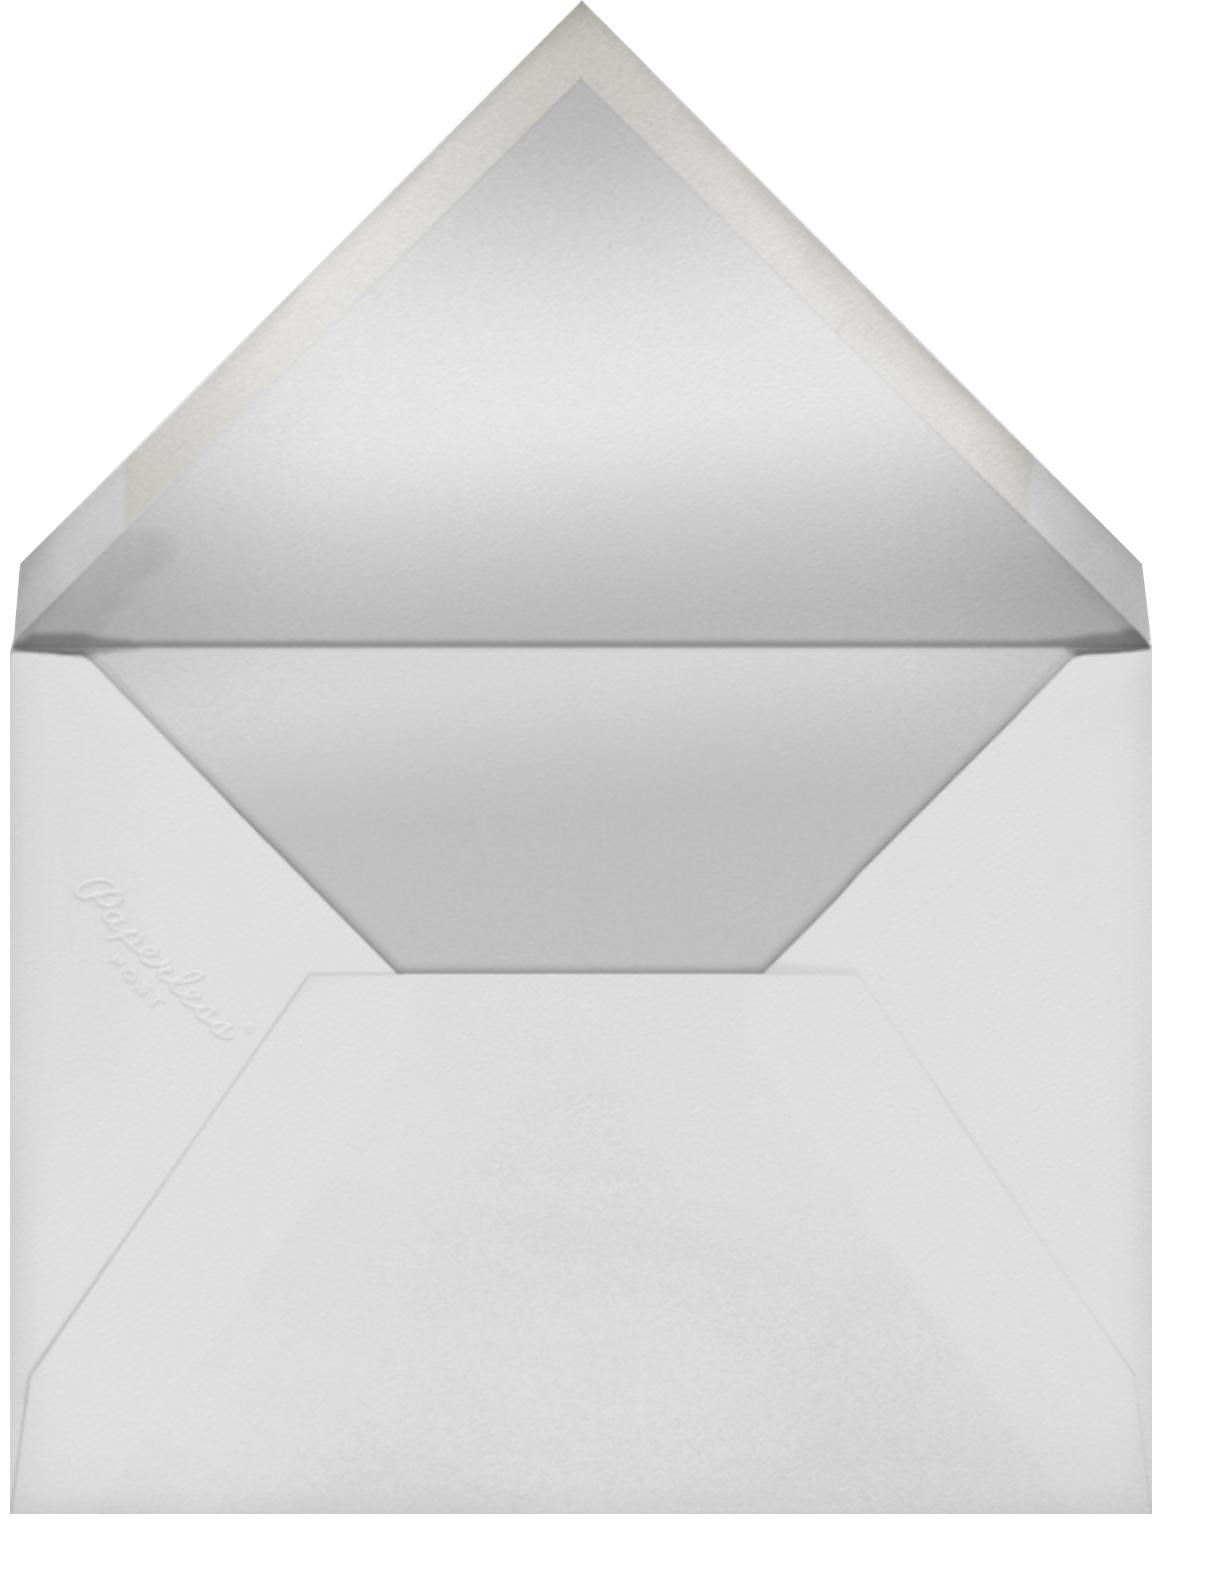 Palmier II (Program) - Caribbean - Paperless Post - Menus and programs - envelope back